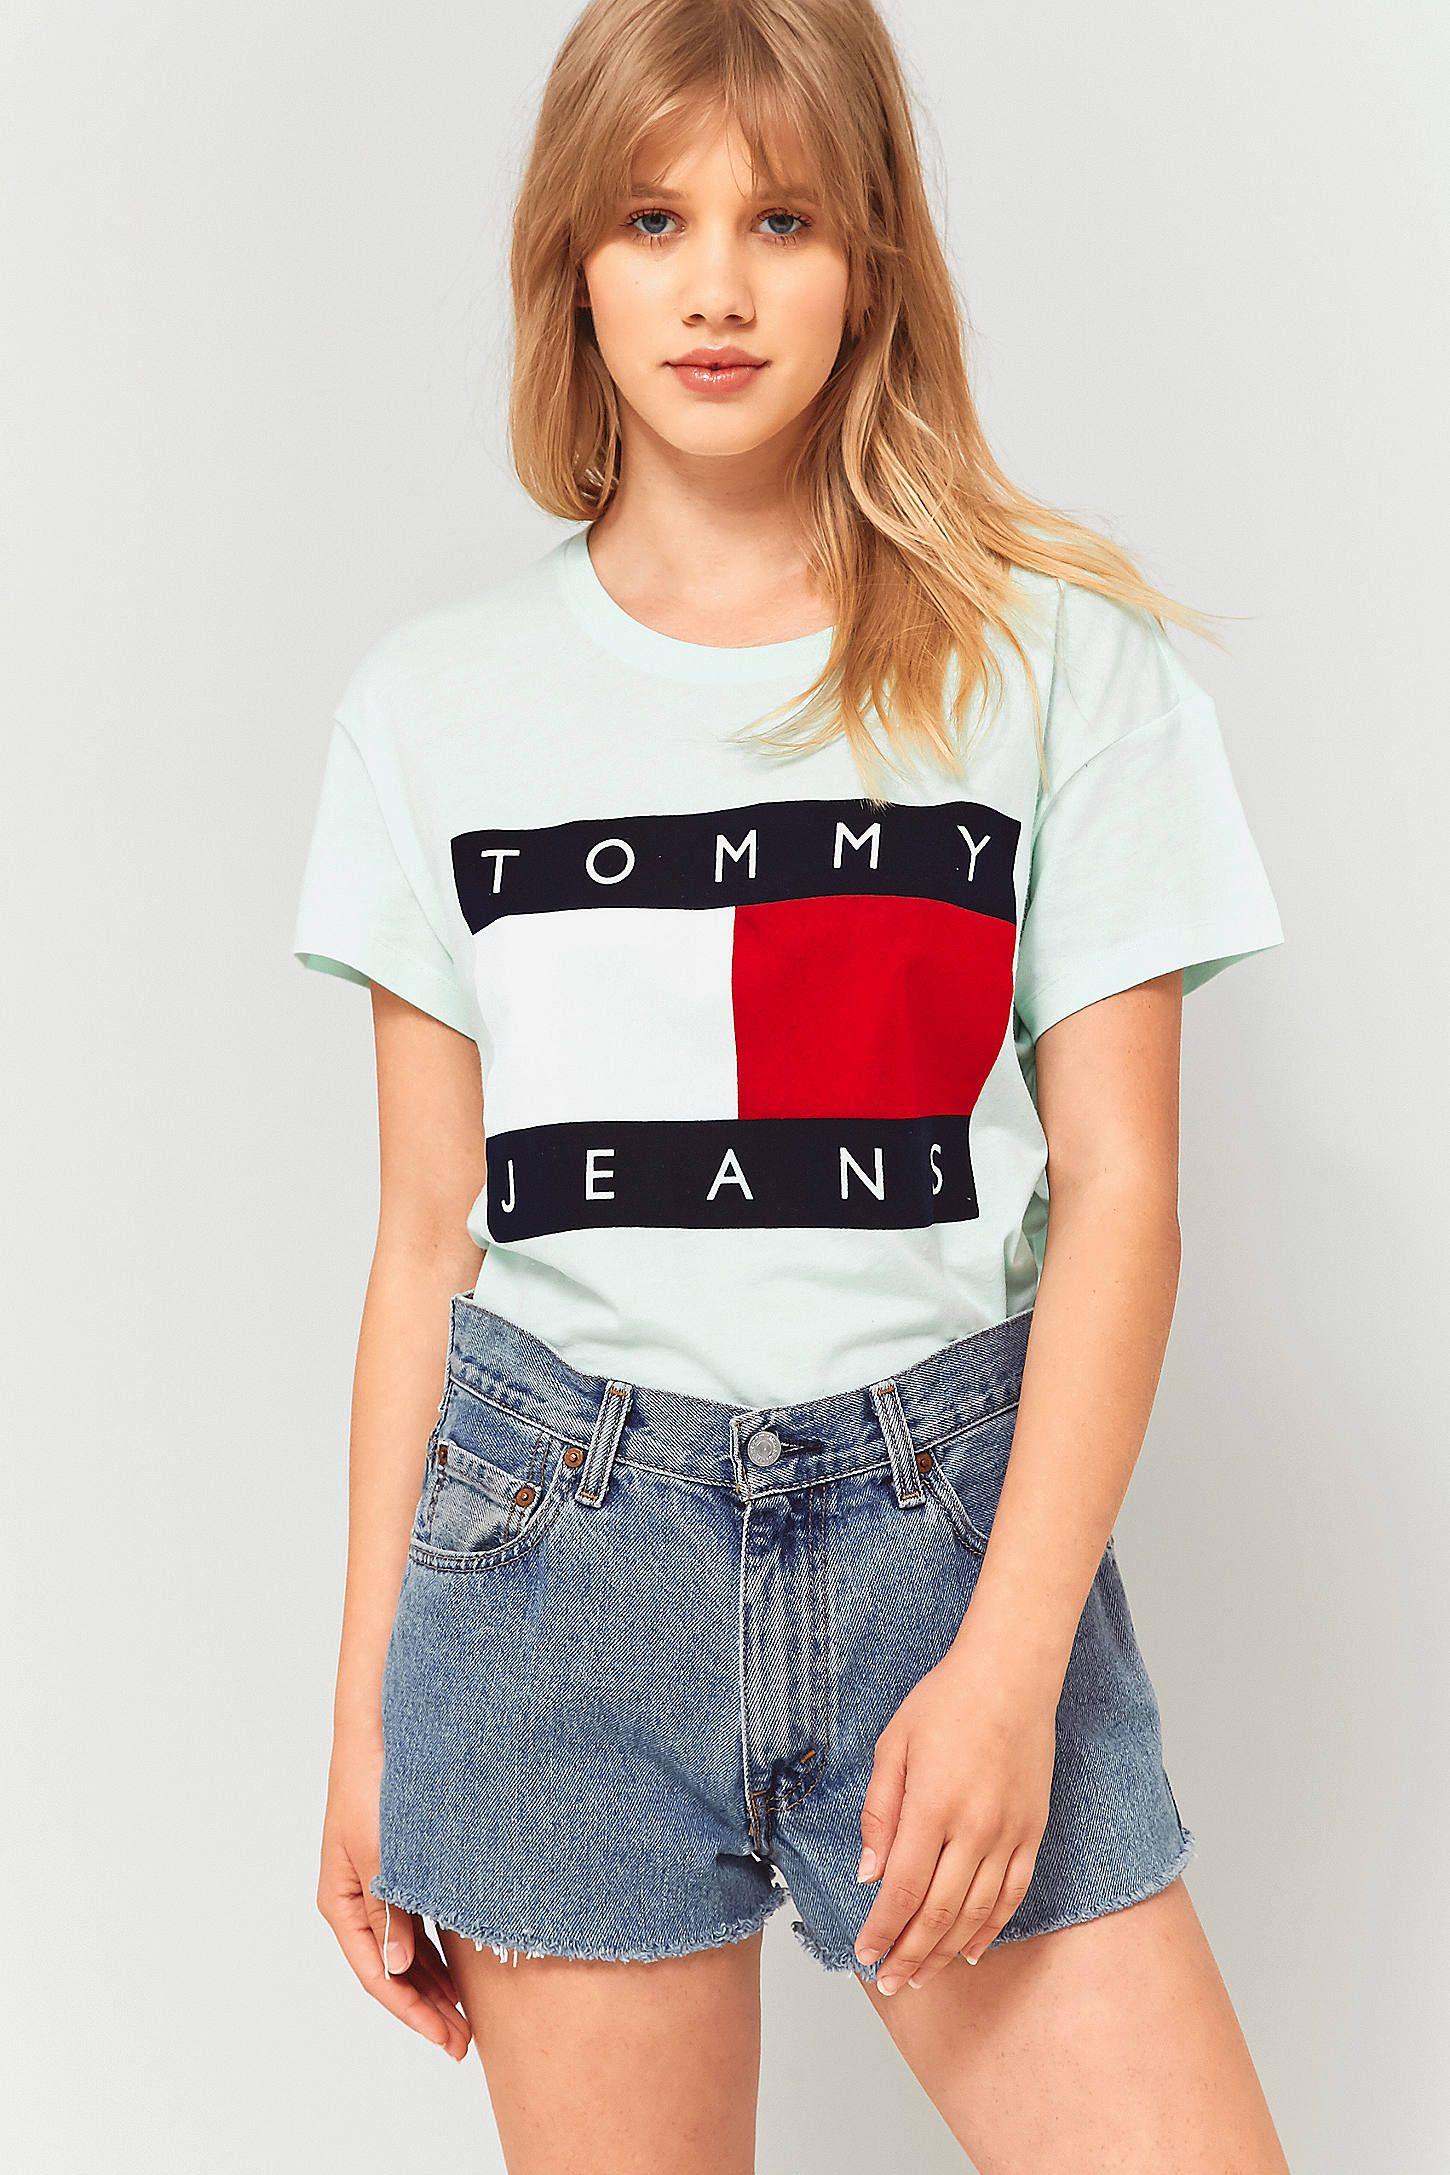 b84996721856 Tommy Jeans '90s Mint Green Logo T-Shirt | Sporty spice! | Tommy ...